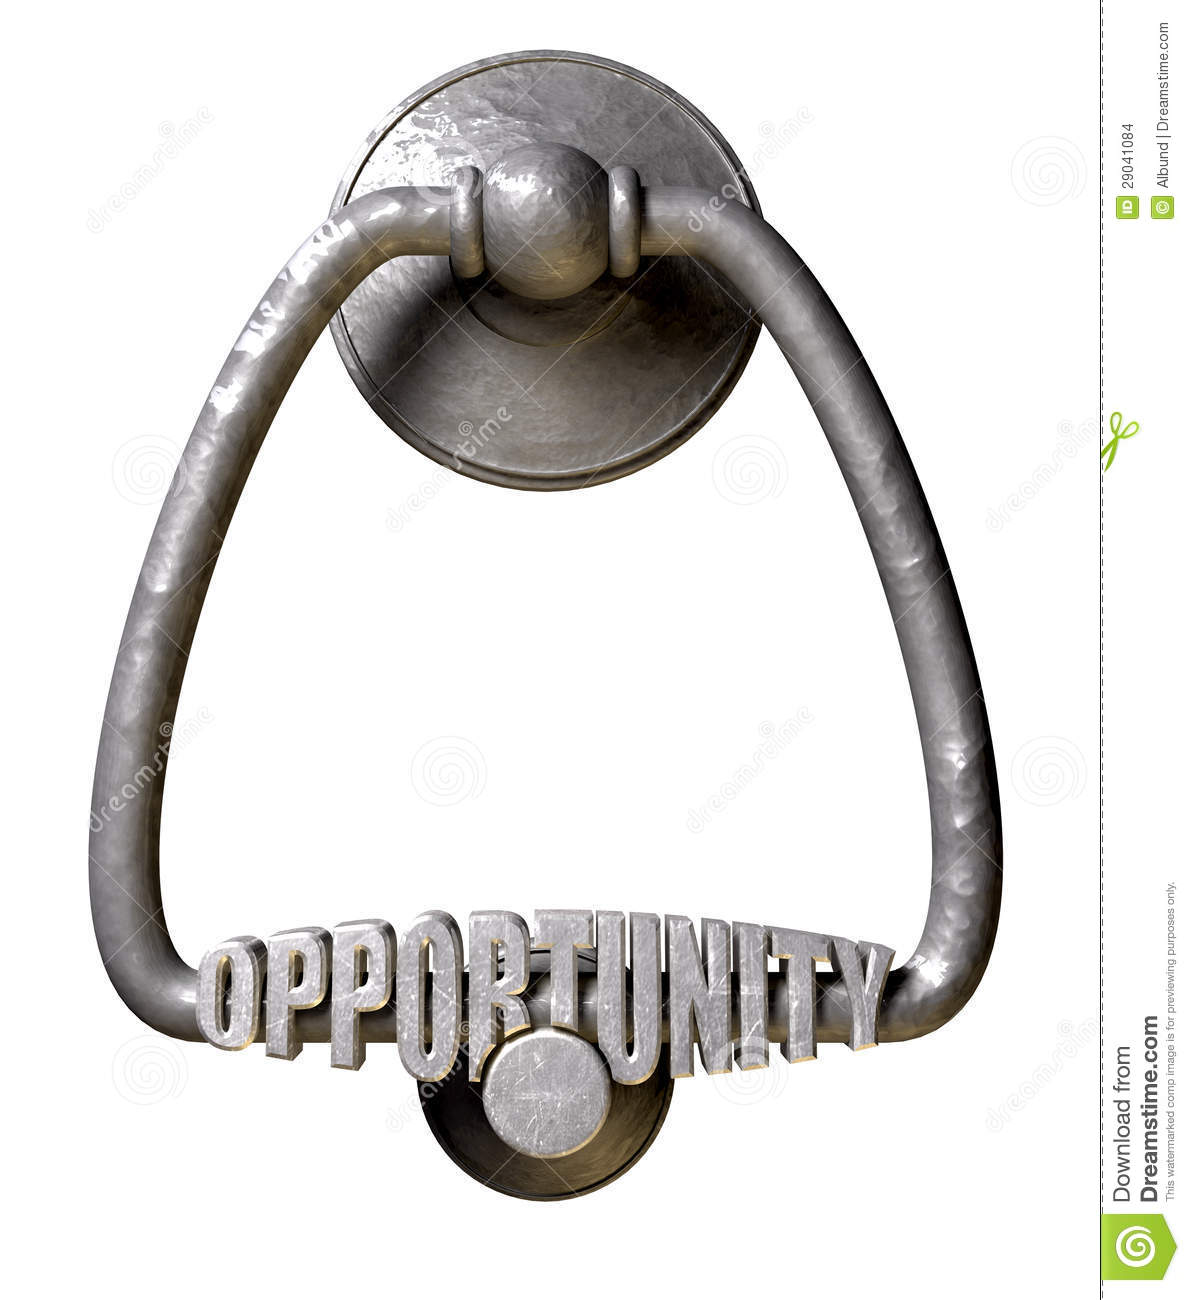 Opportunity Knocks Door Knocker Stock Images Image 29041084.